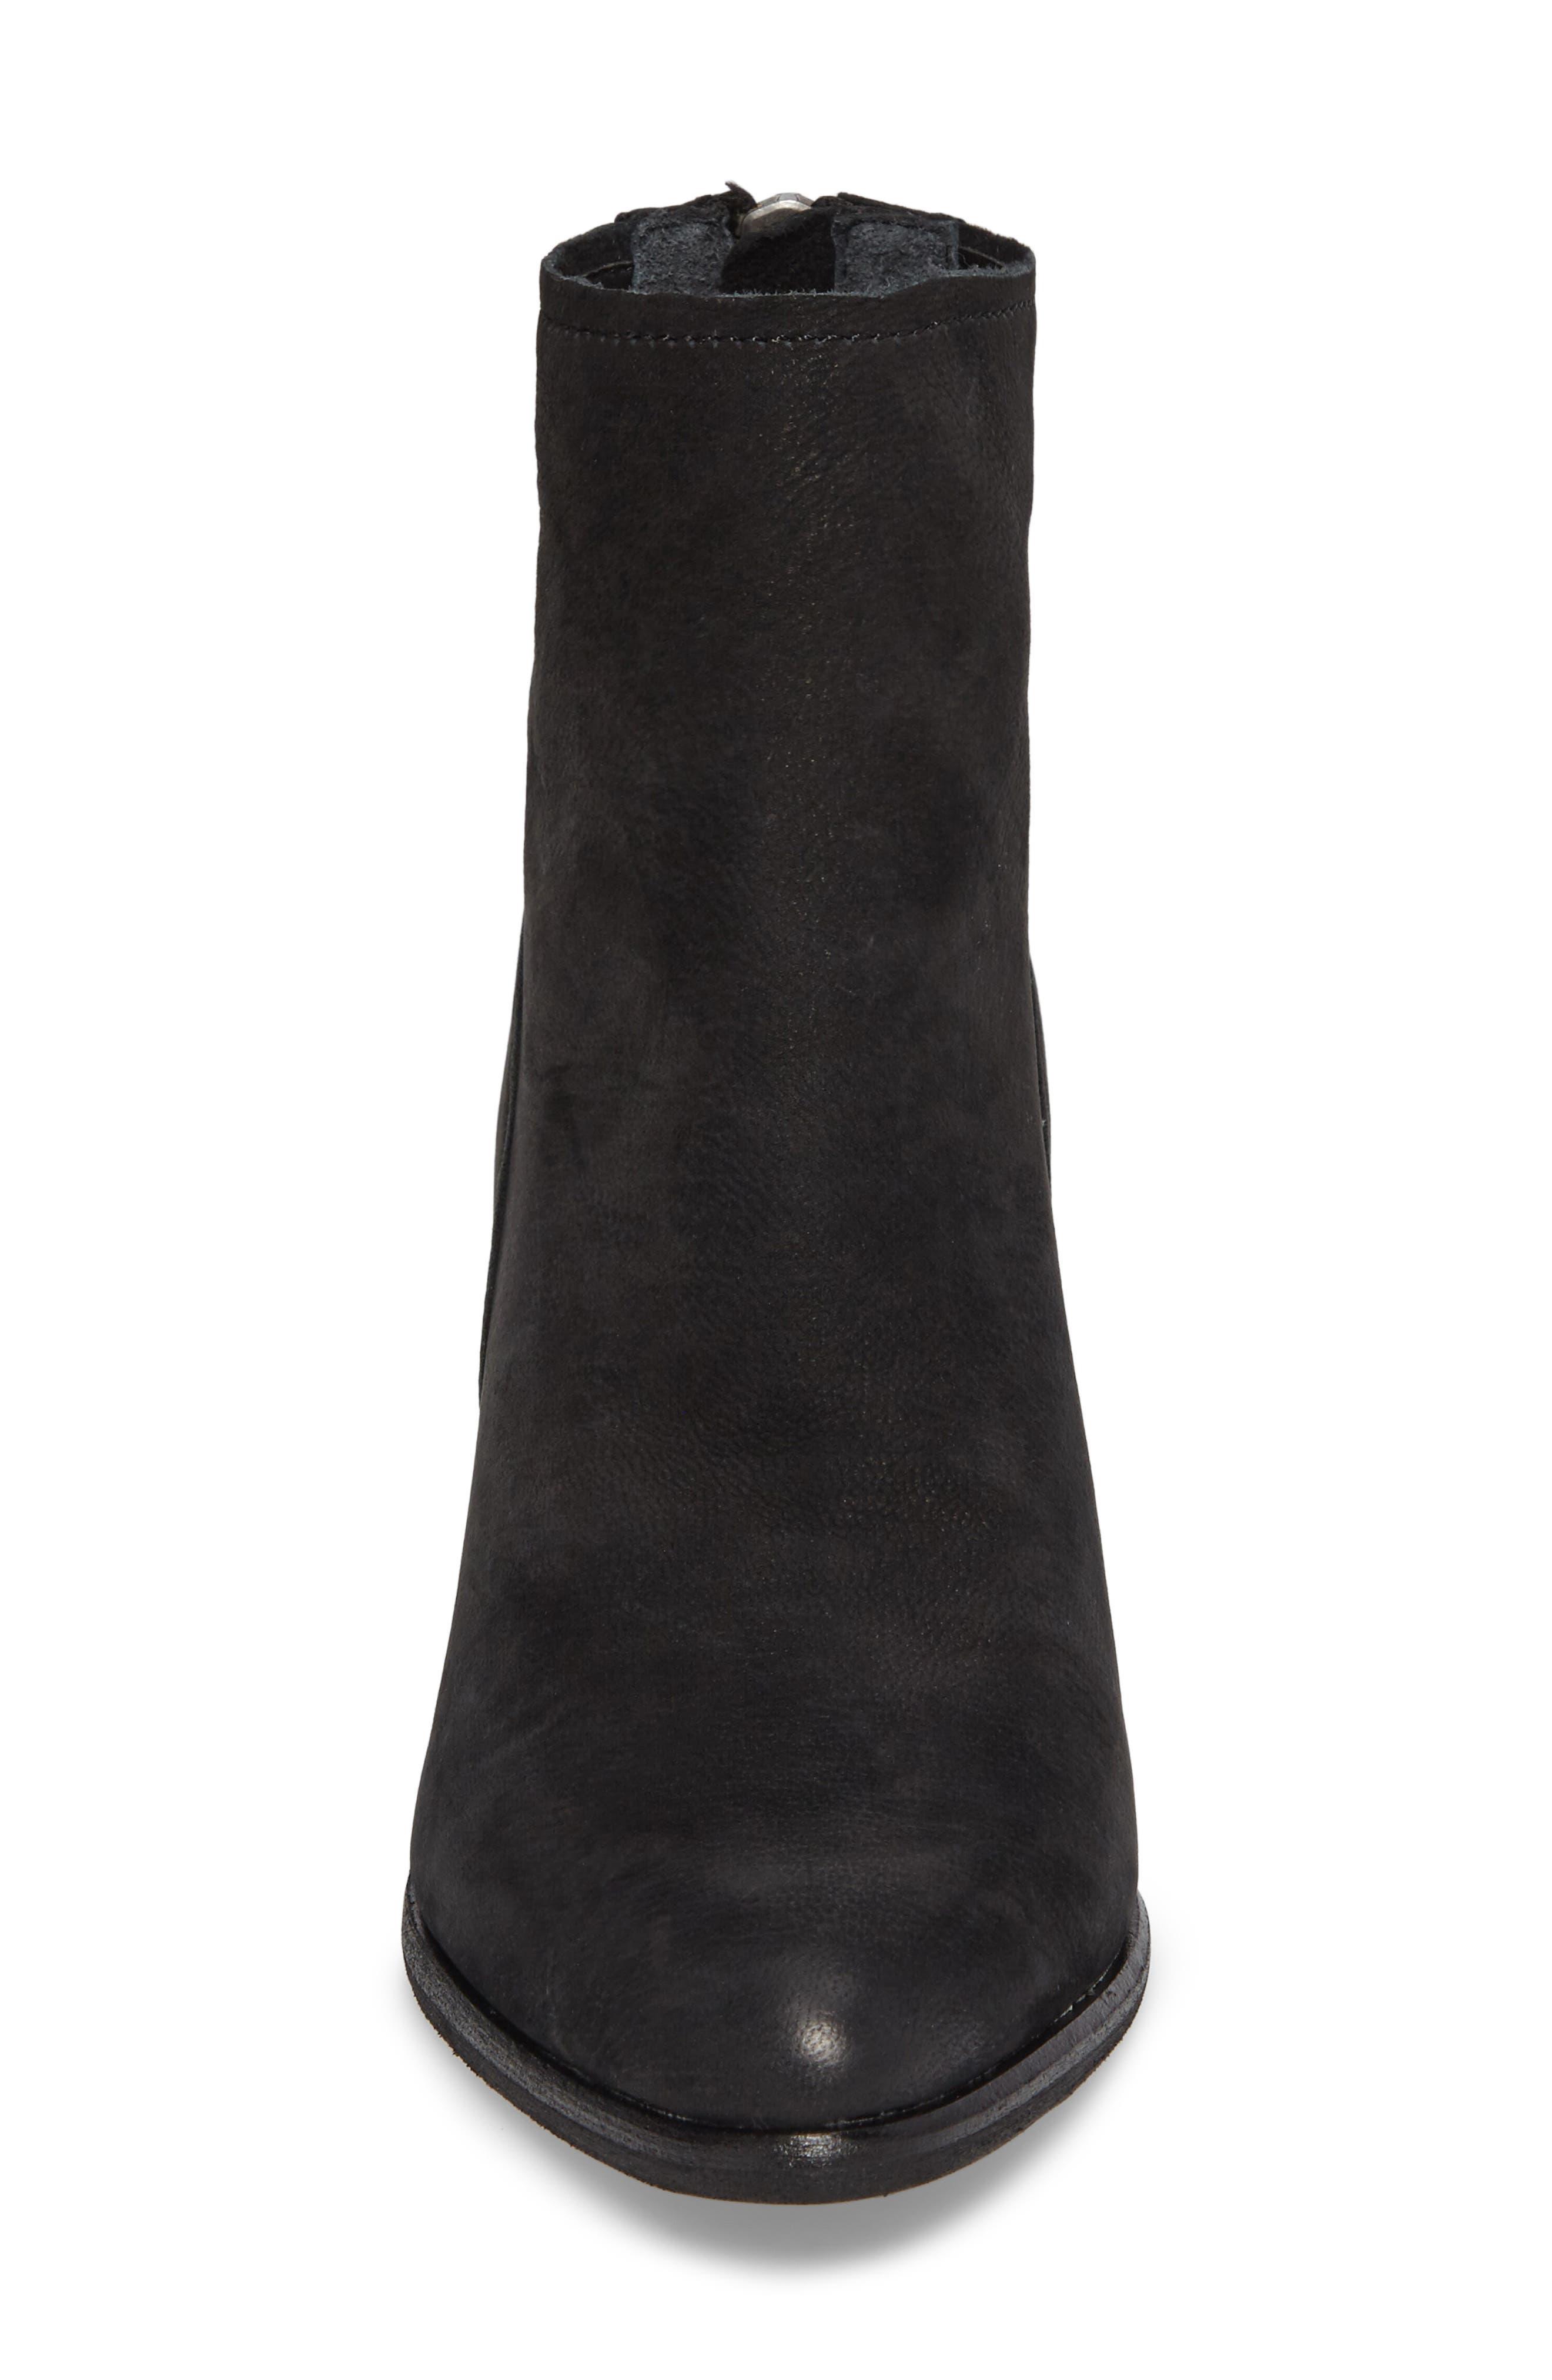 Cassius Block Heel Bootie,                             Alternate thumbnail 4, color,                             Black Nubuck Leather